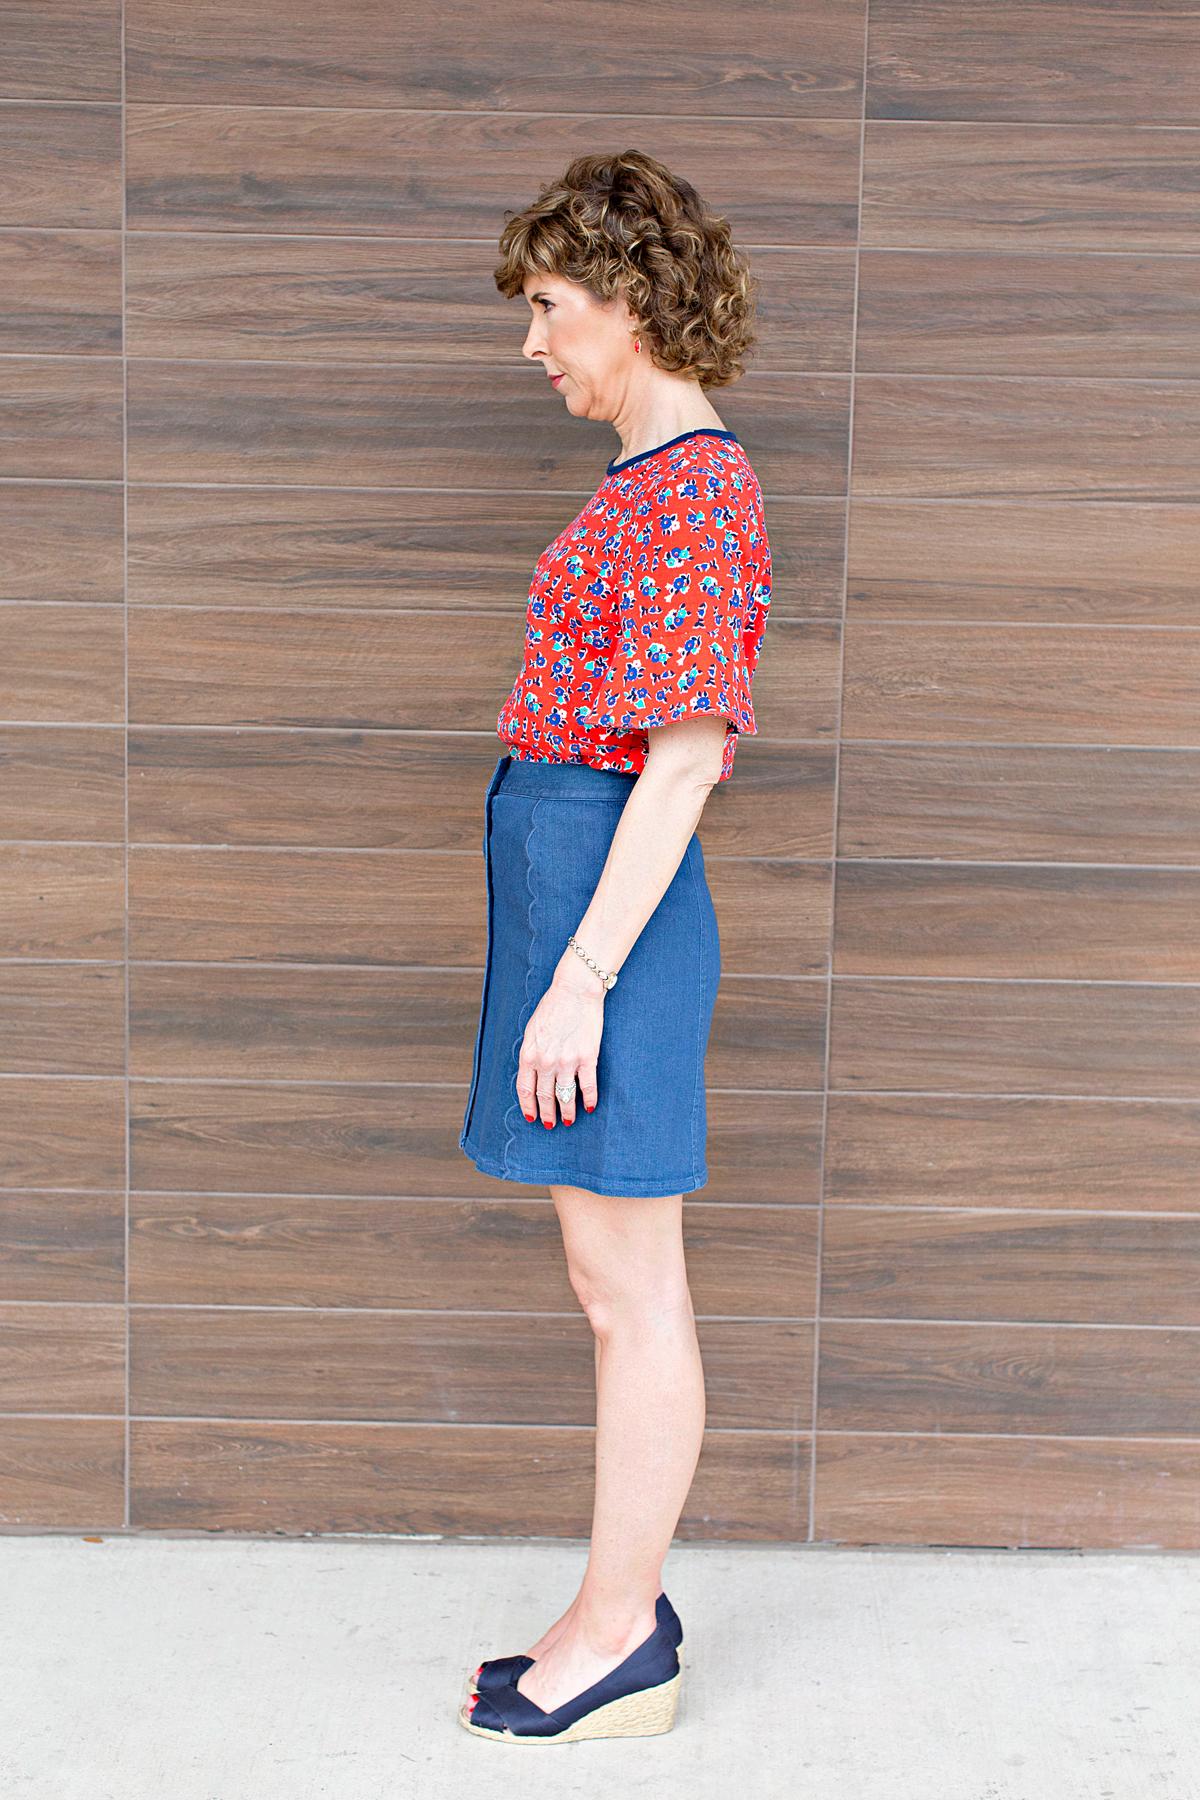 posture, perfect posture, posture tips, posture trainer, posture exercises, posture correction, bad posture, good posture